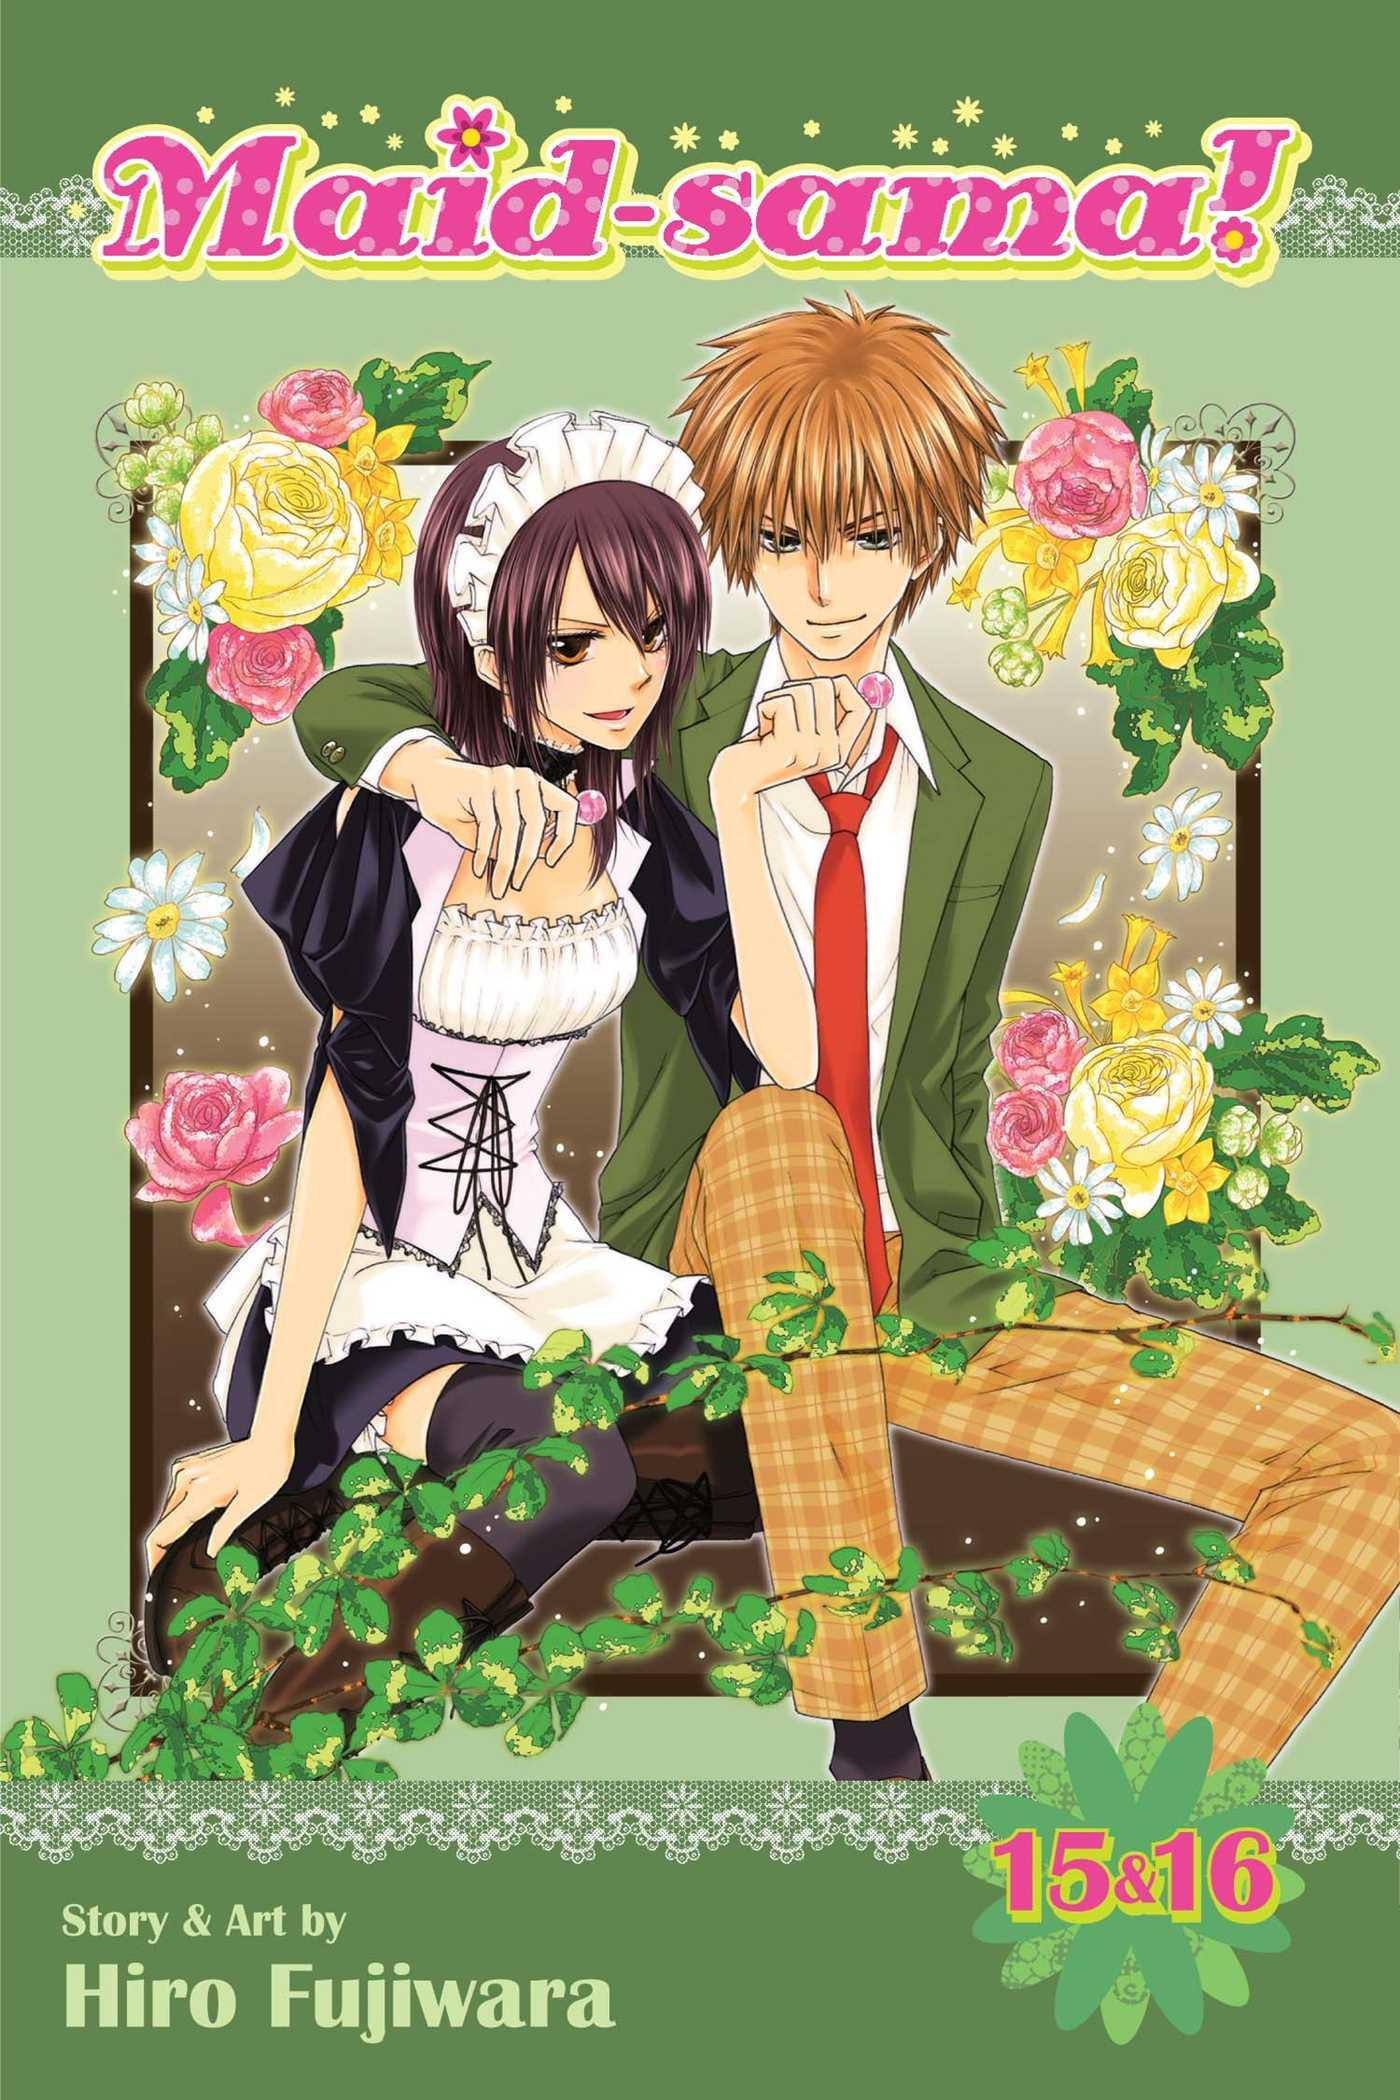 Maid-sama! 2 in 1 Edition Manga Volume 8